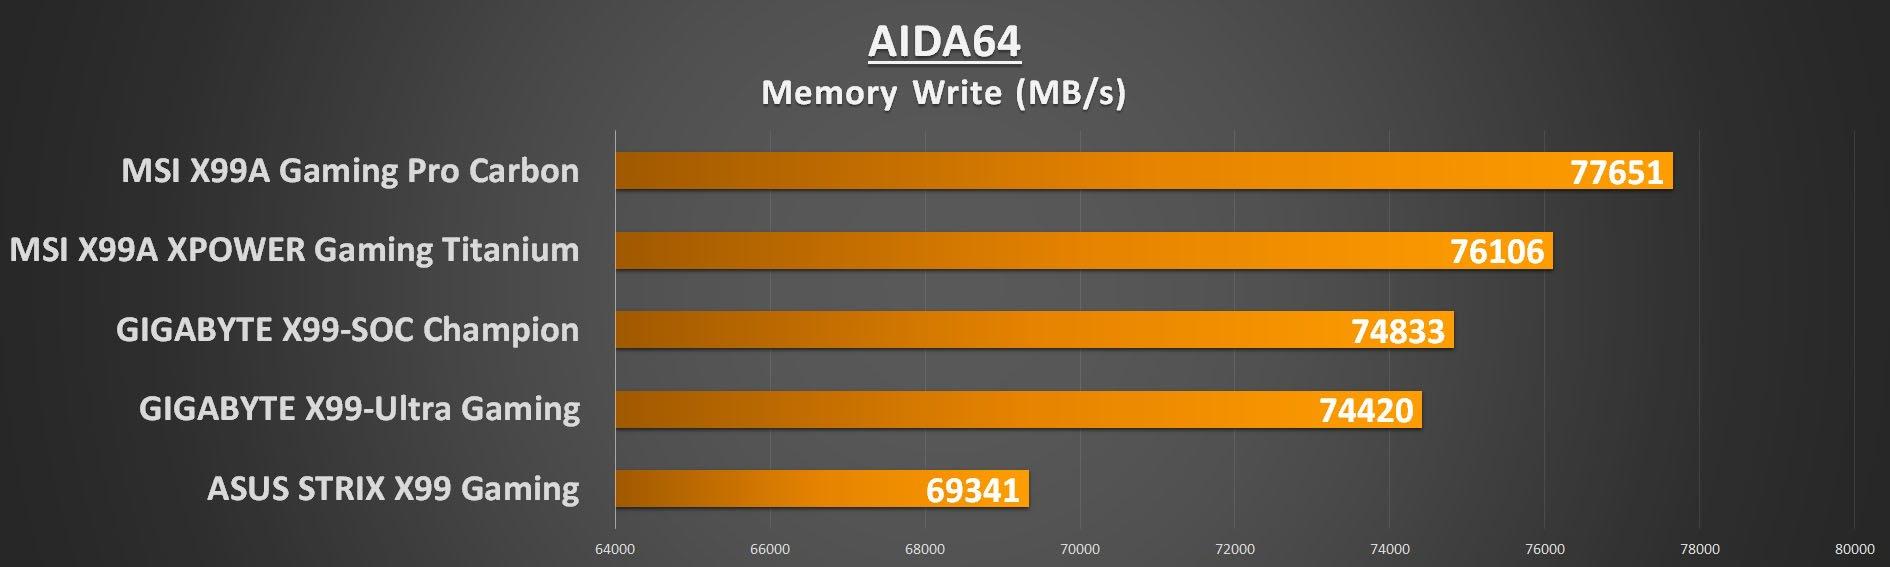 gigabyte-x99-ultra-gaming-aida-mem-write